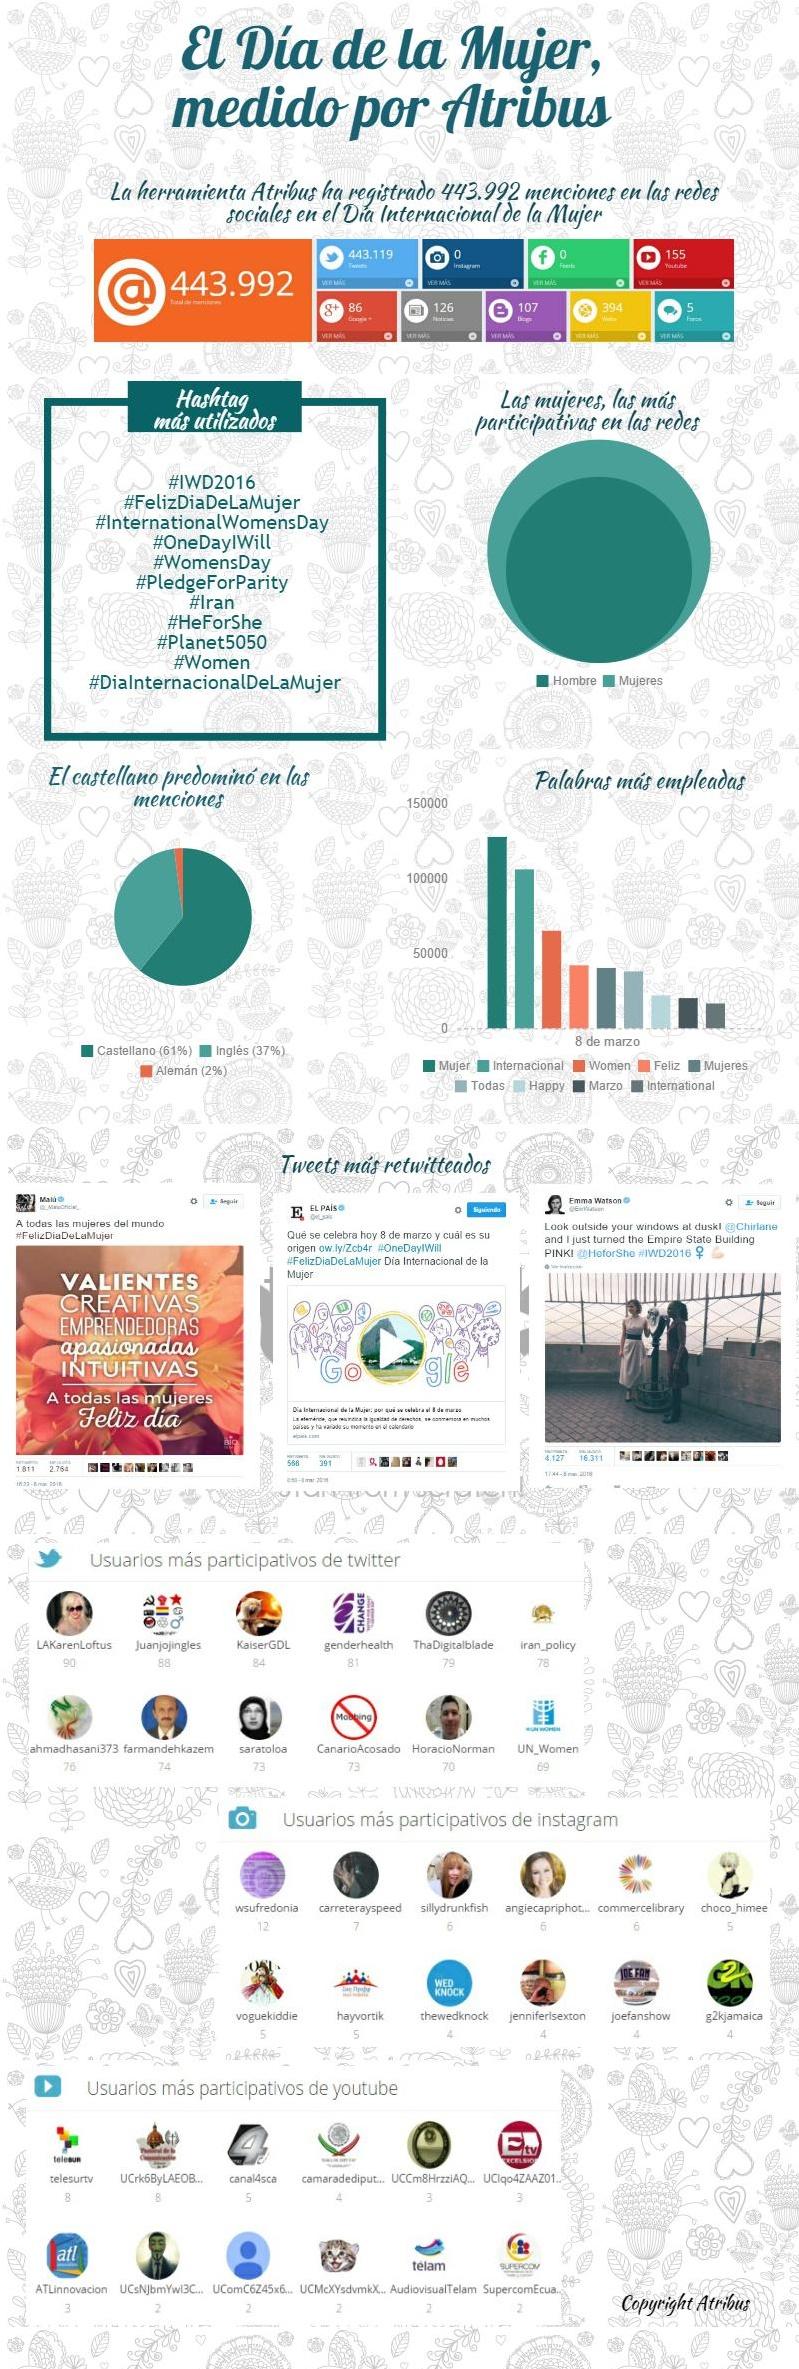 infografia dia mujer